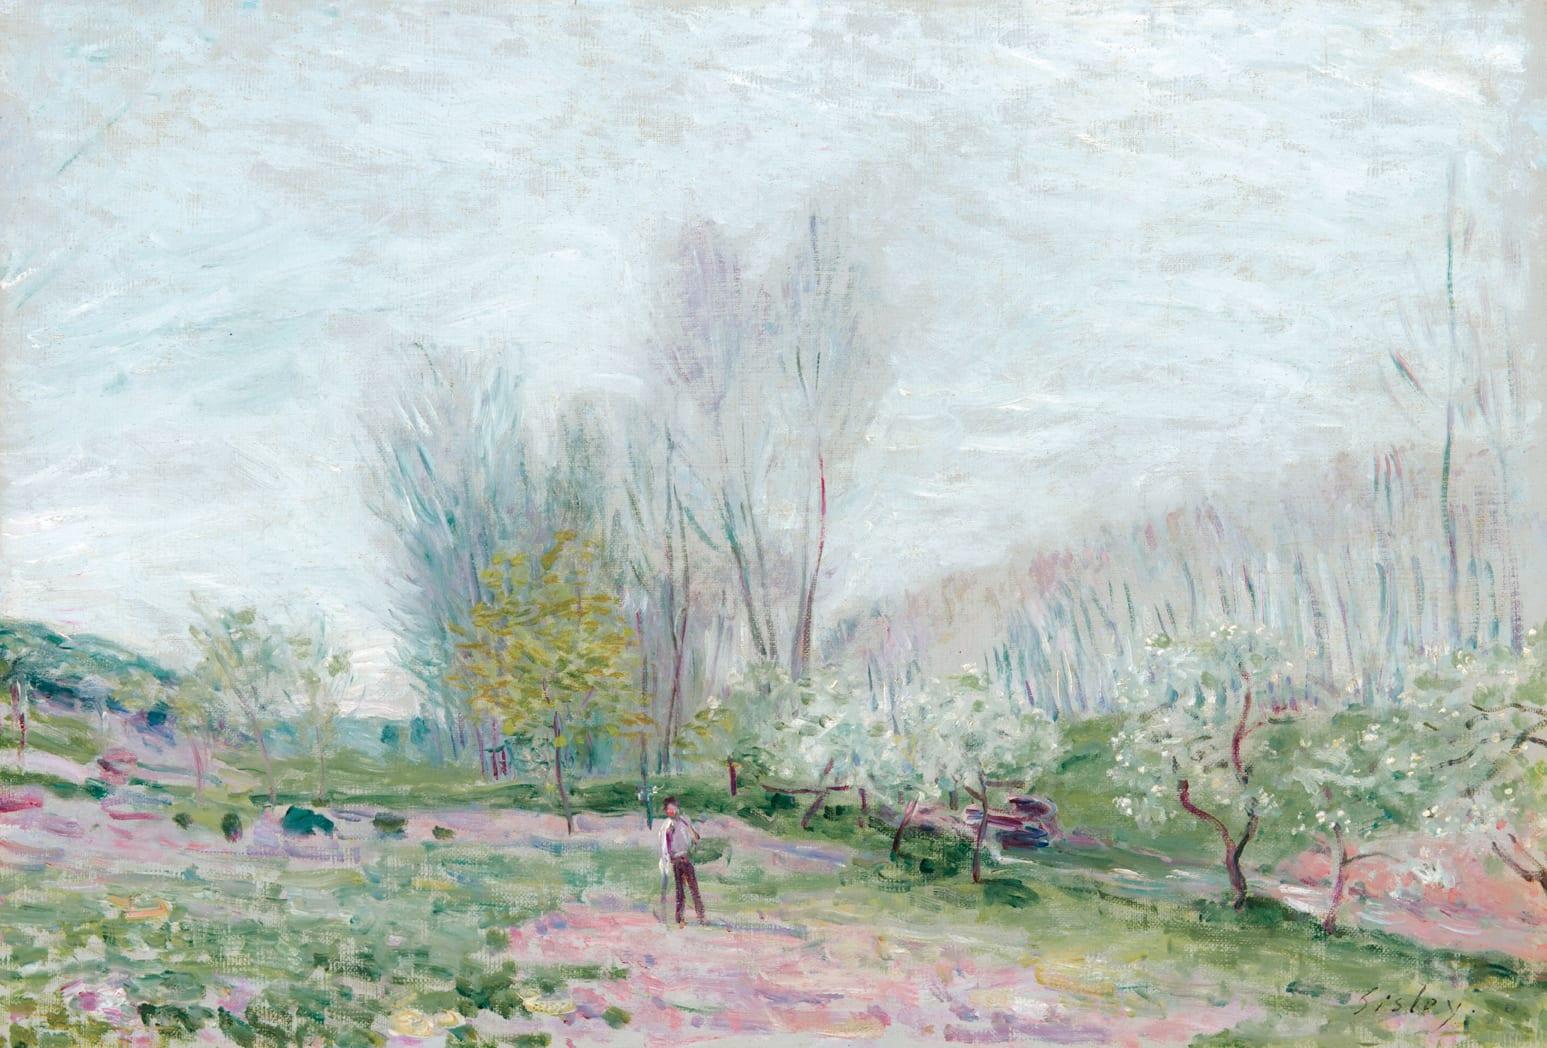 ALFRED SISLEY, Paysage d'été à Veneux-Nadon, circa 1880-1890